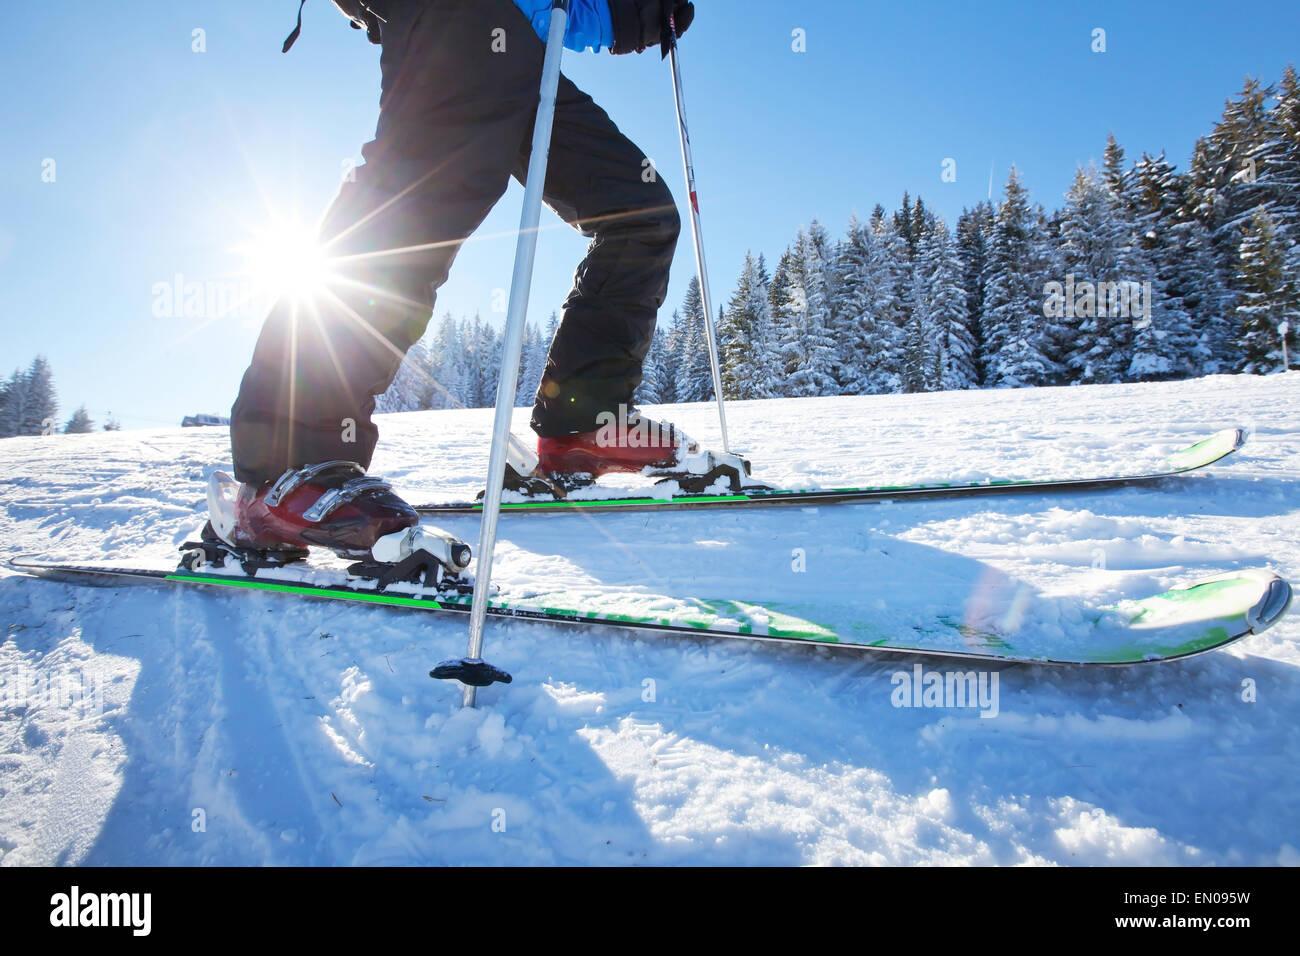 close up of ski low angle - Stock Image